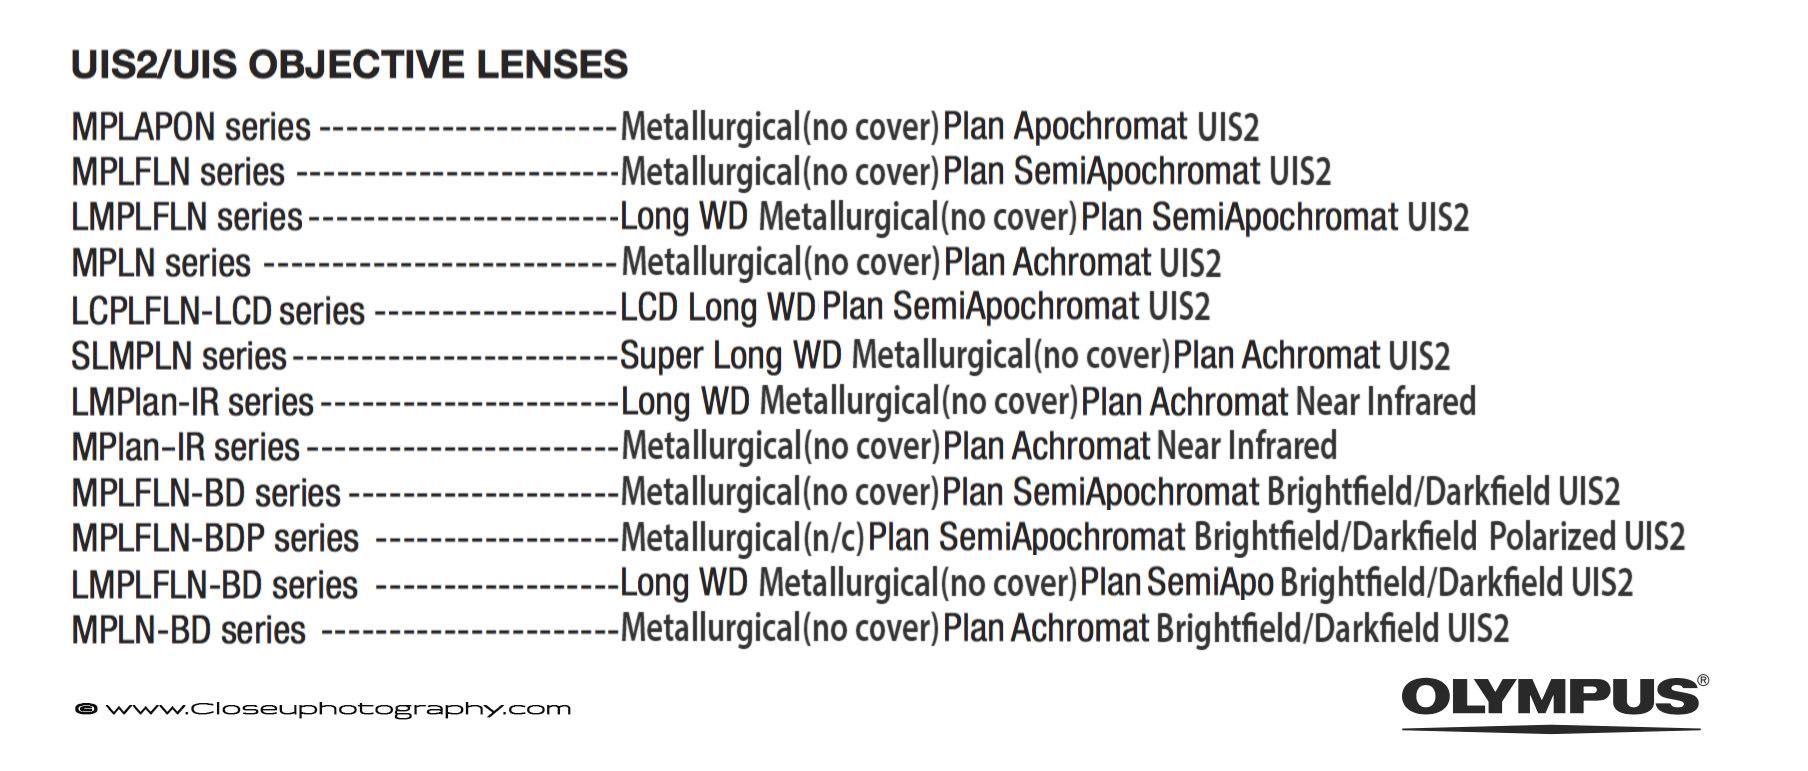 Olympus-UIS2-UIS-objectives.jpg